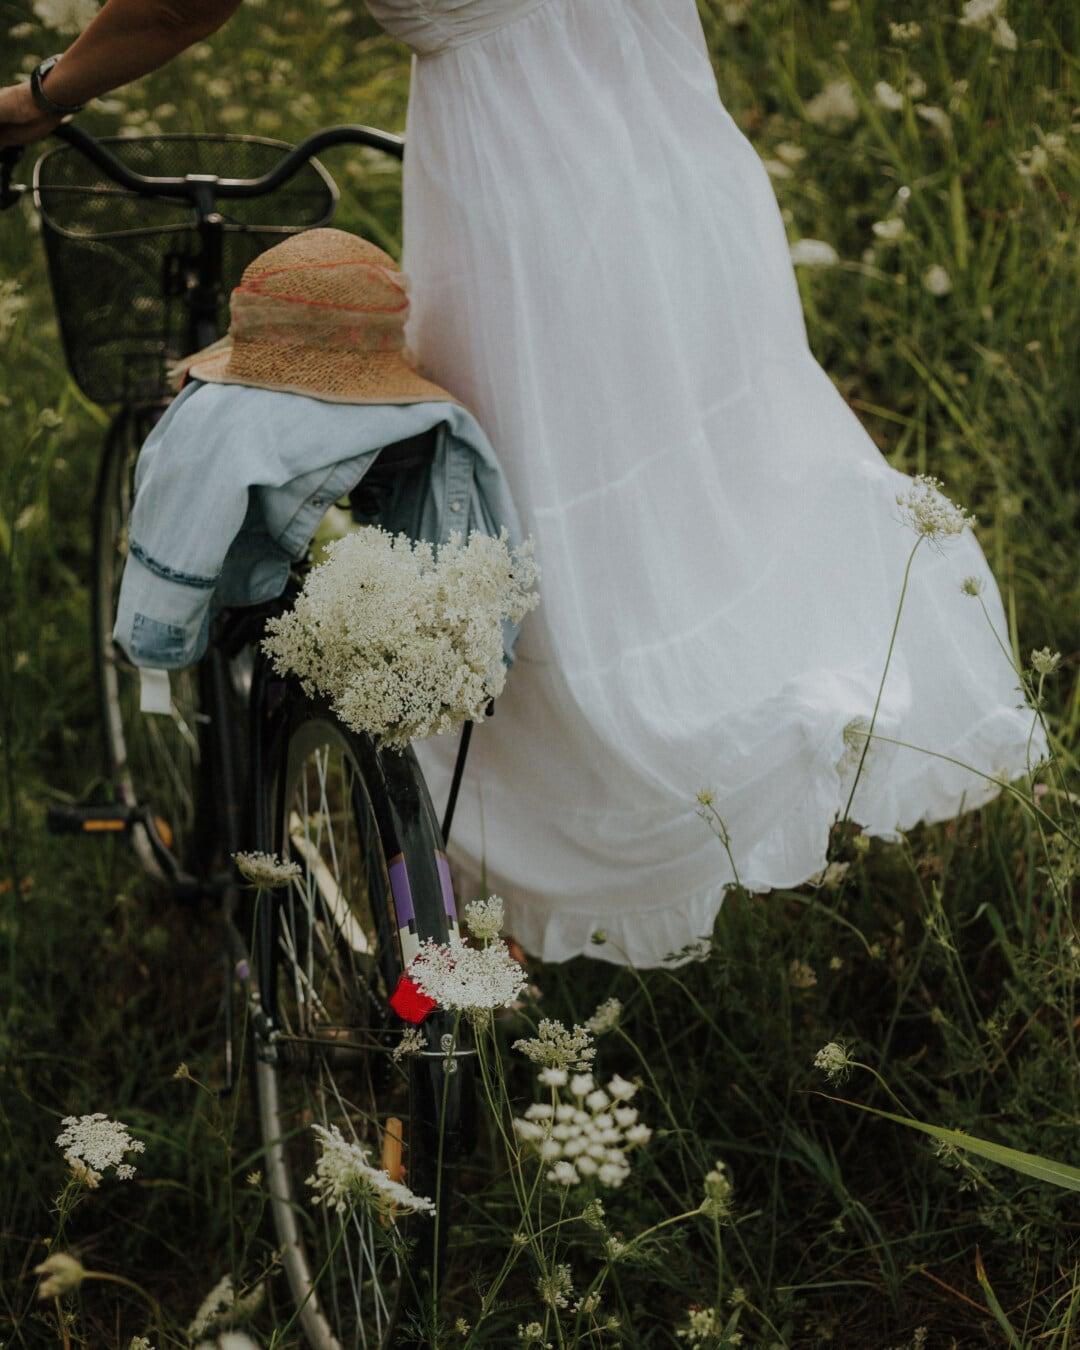 bicycle, girl, dress, wildflower, hat, nostalgia, vintage, bride, flower, engagement